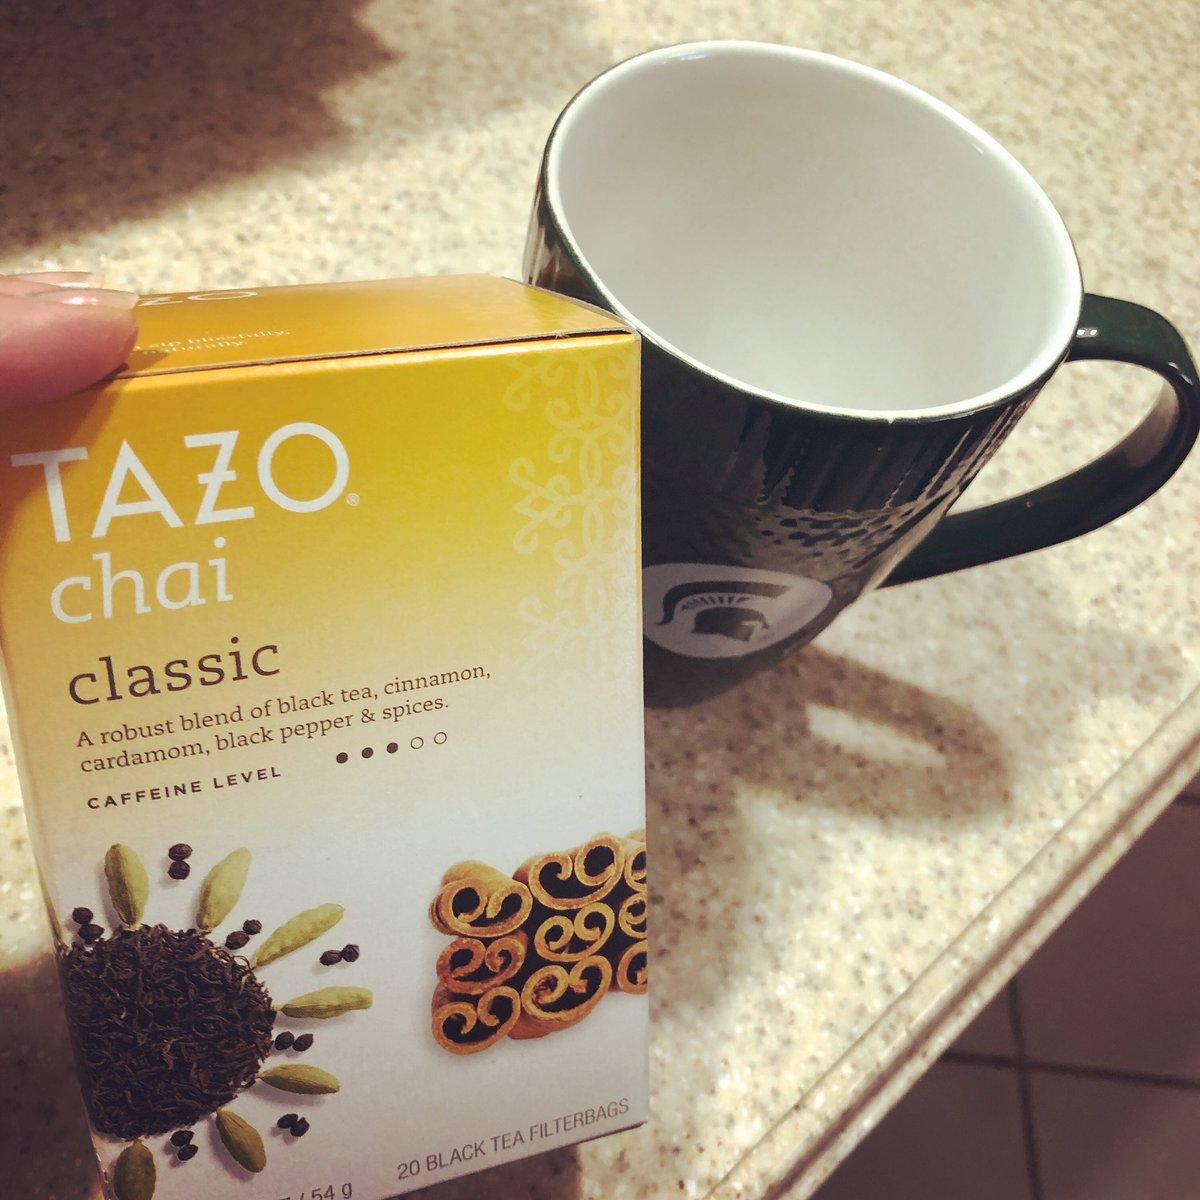 Tea time on a rainy night at home ☕️ #rest #tazotea #myfave #teatime